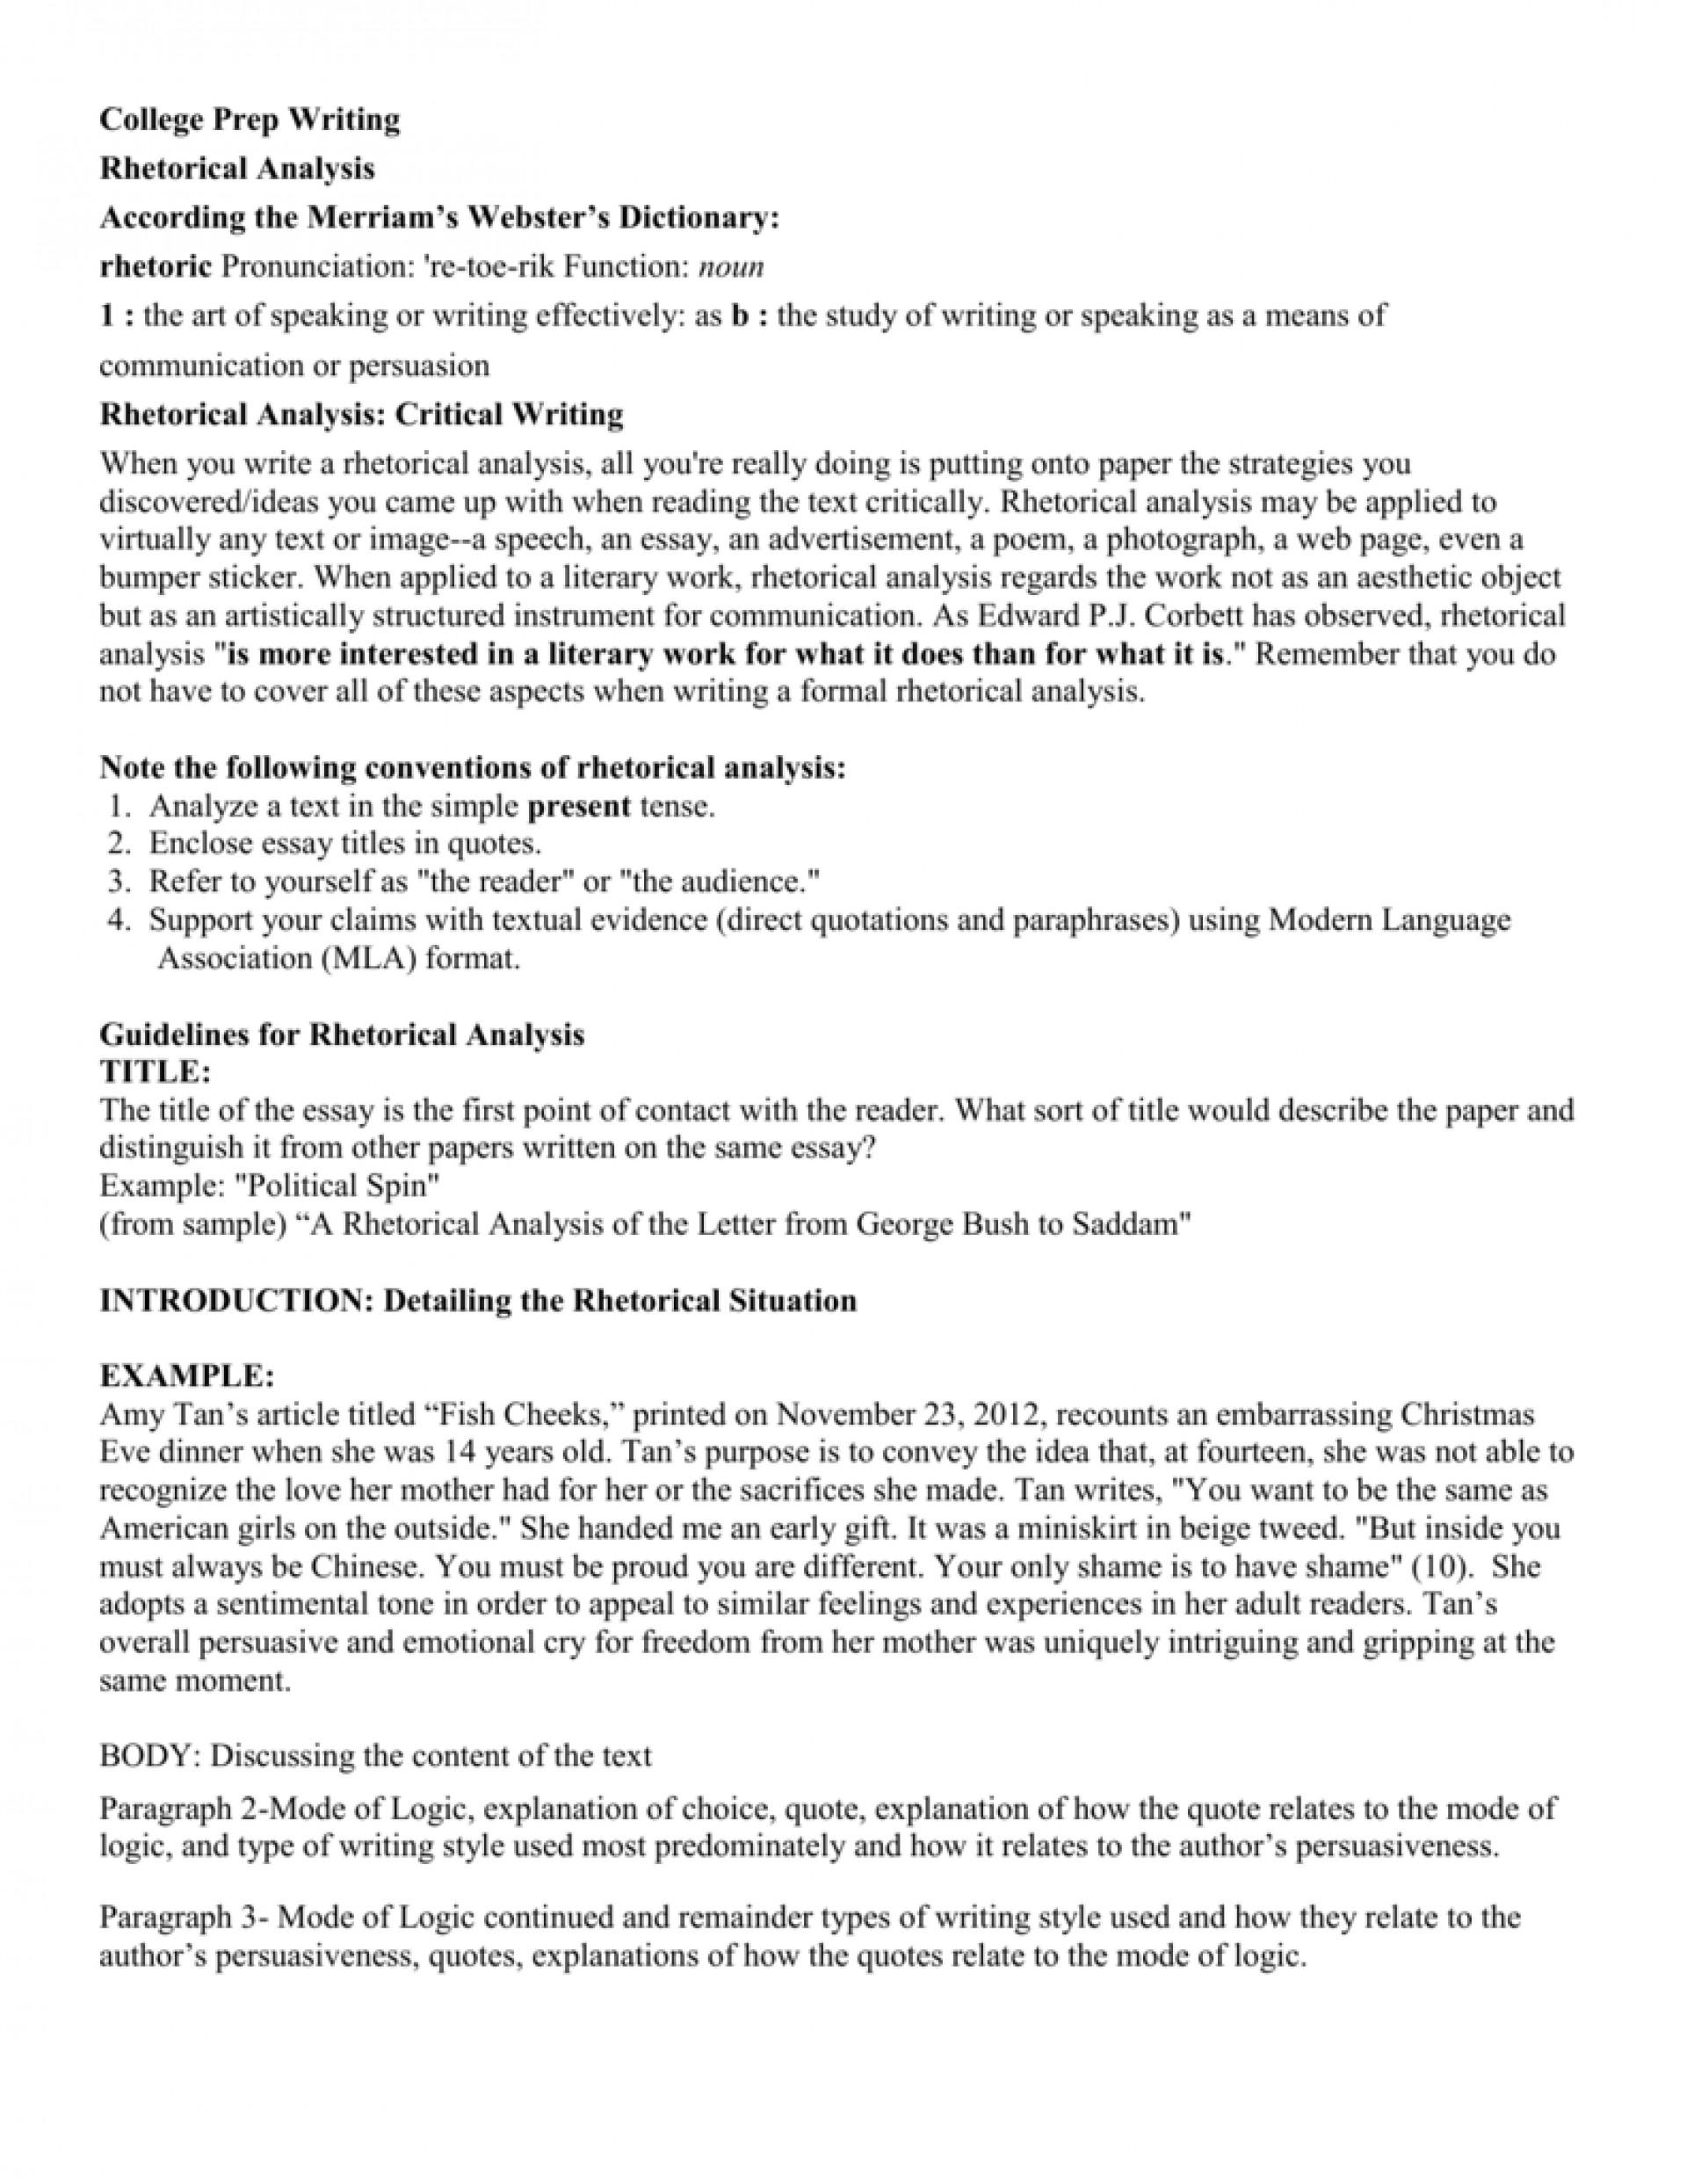 001 Rhetorical Situation Example Essay 007662368 2 Imposing 1920